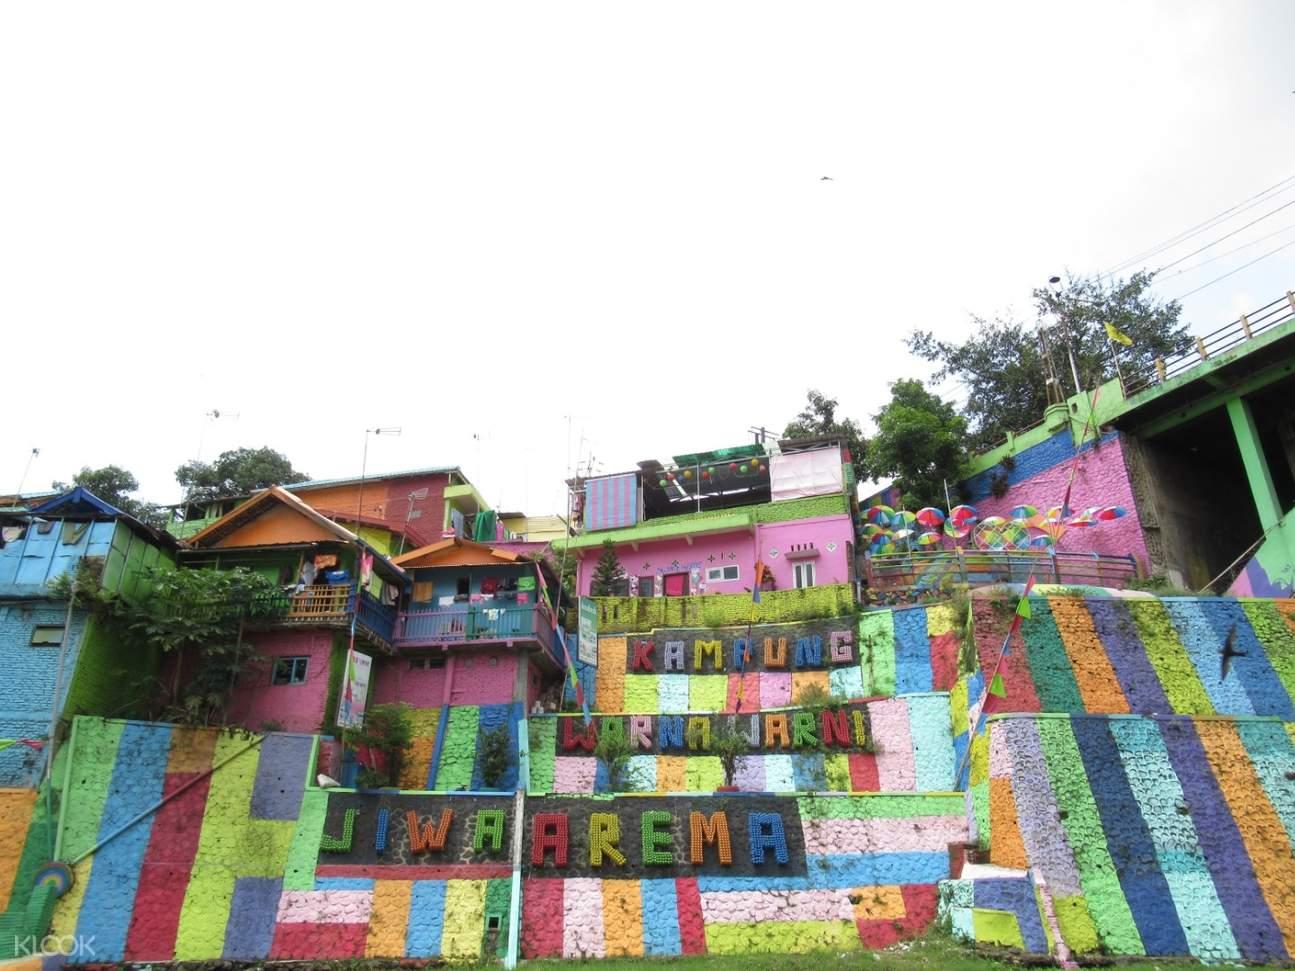 front of jodipan village